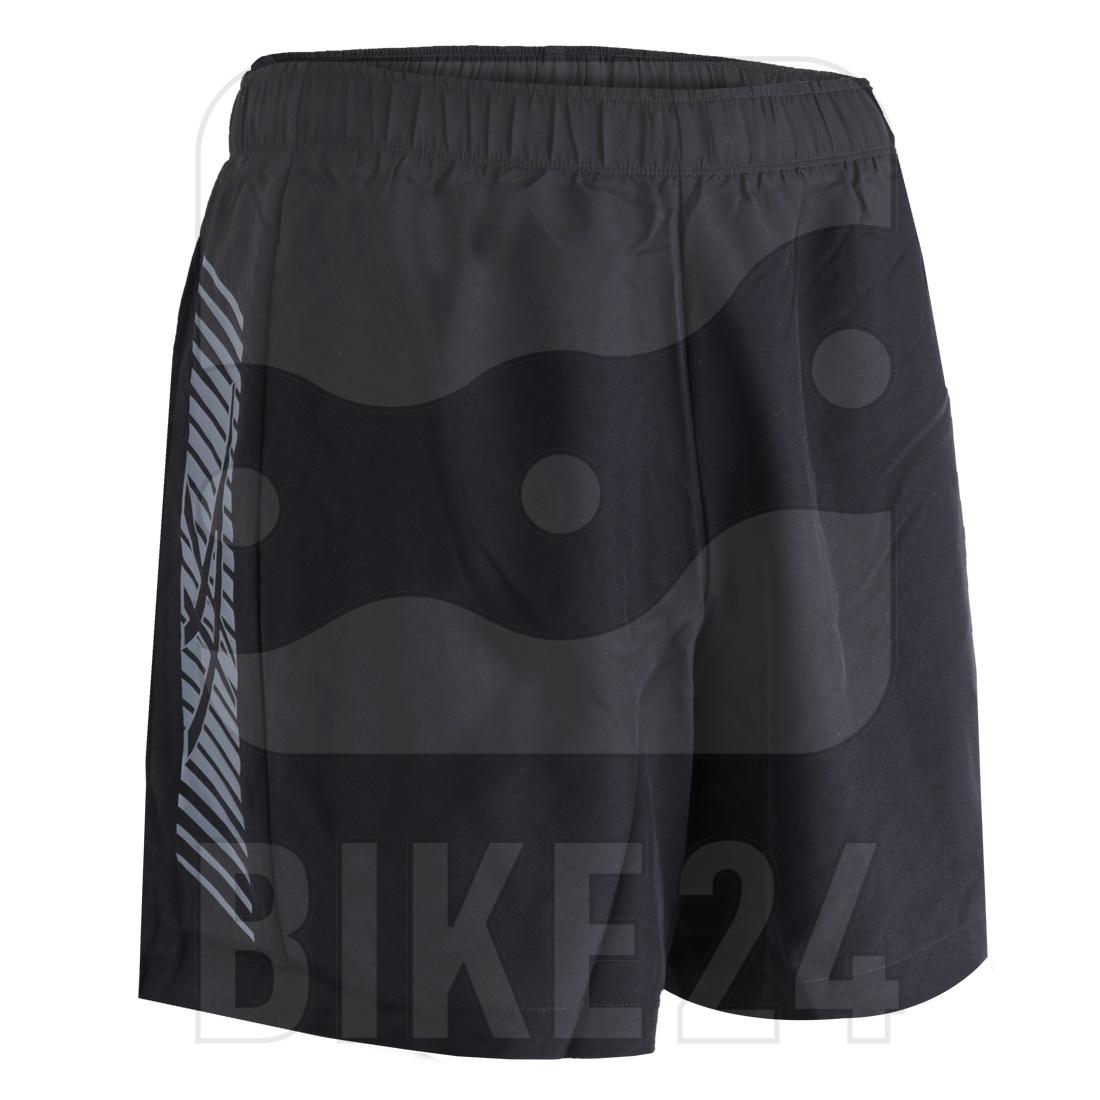 "asics Icon 7"" Running Shorts - performance black/carrier grey"